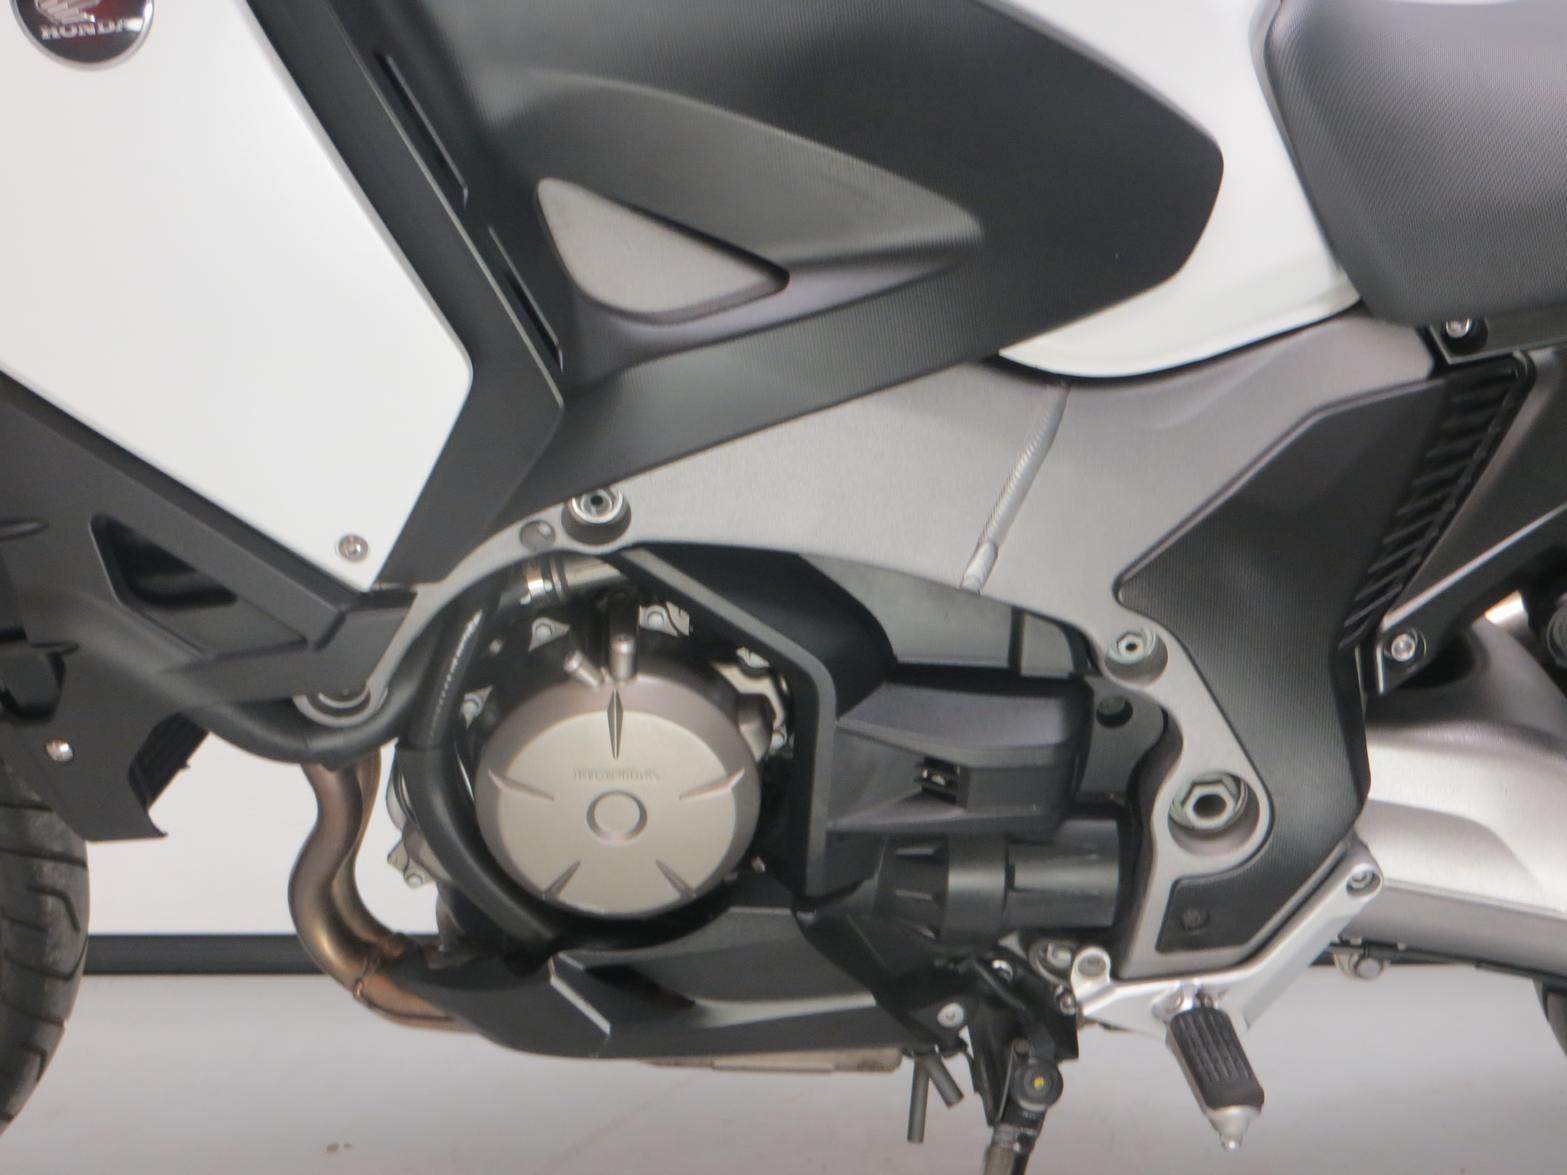 HONDA - VFR 1200 XDE